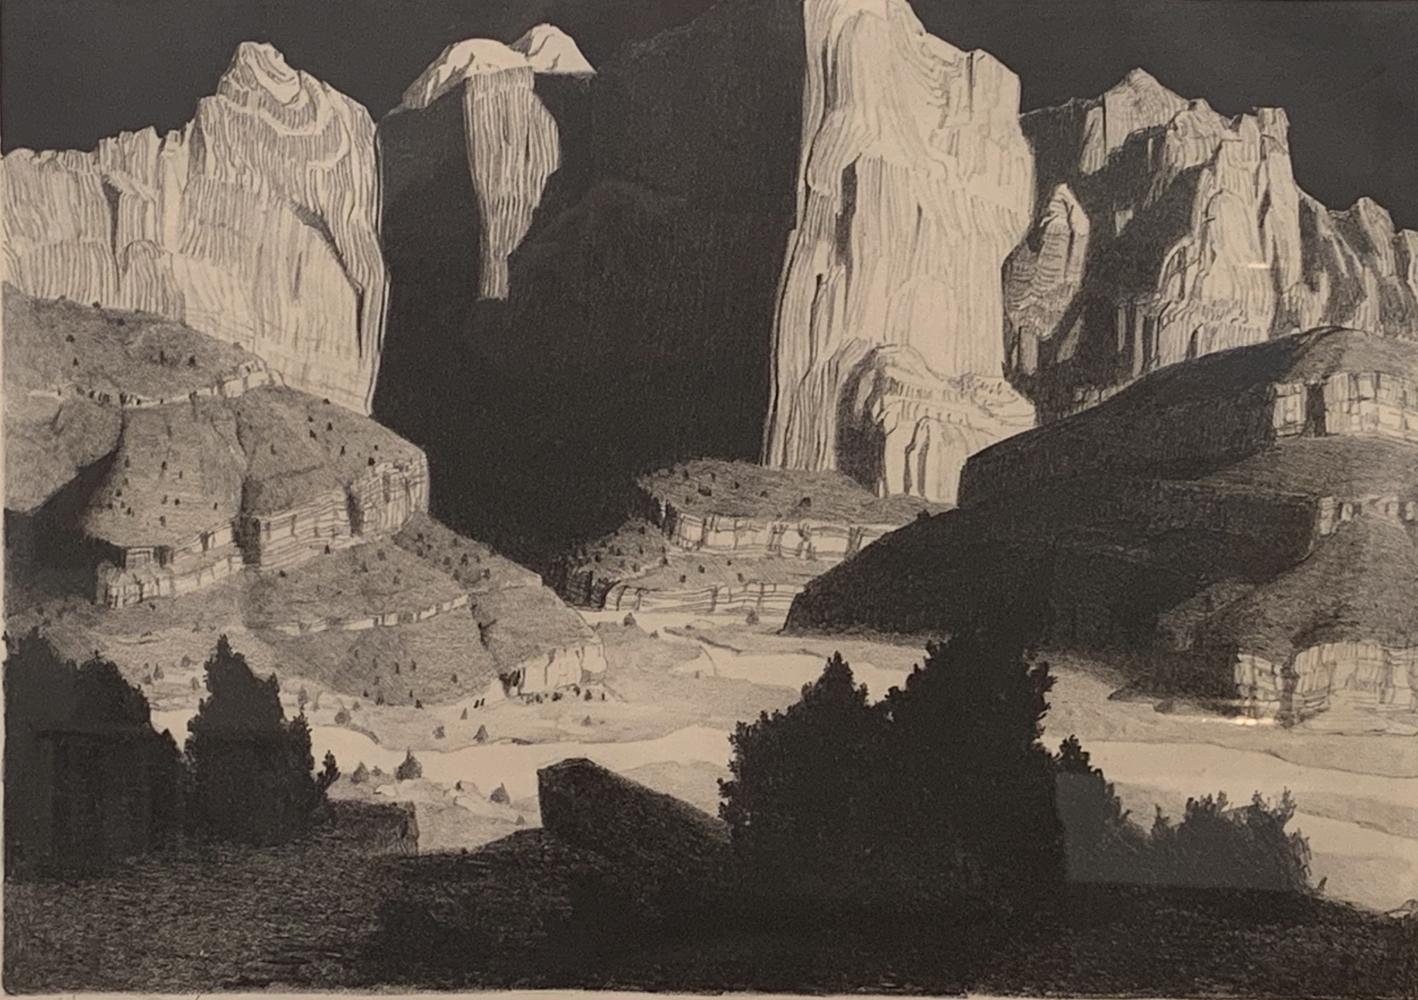 Conrad Buff, California artist, David Dee Fine Arts